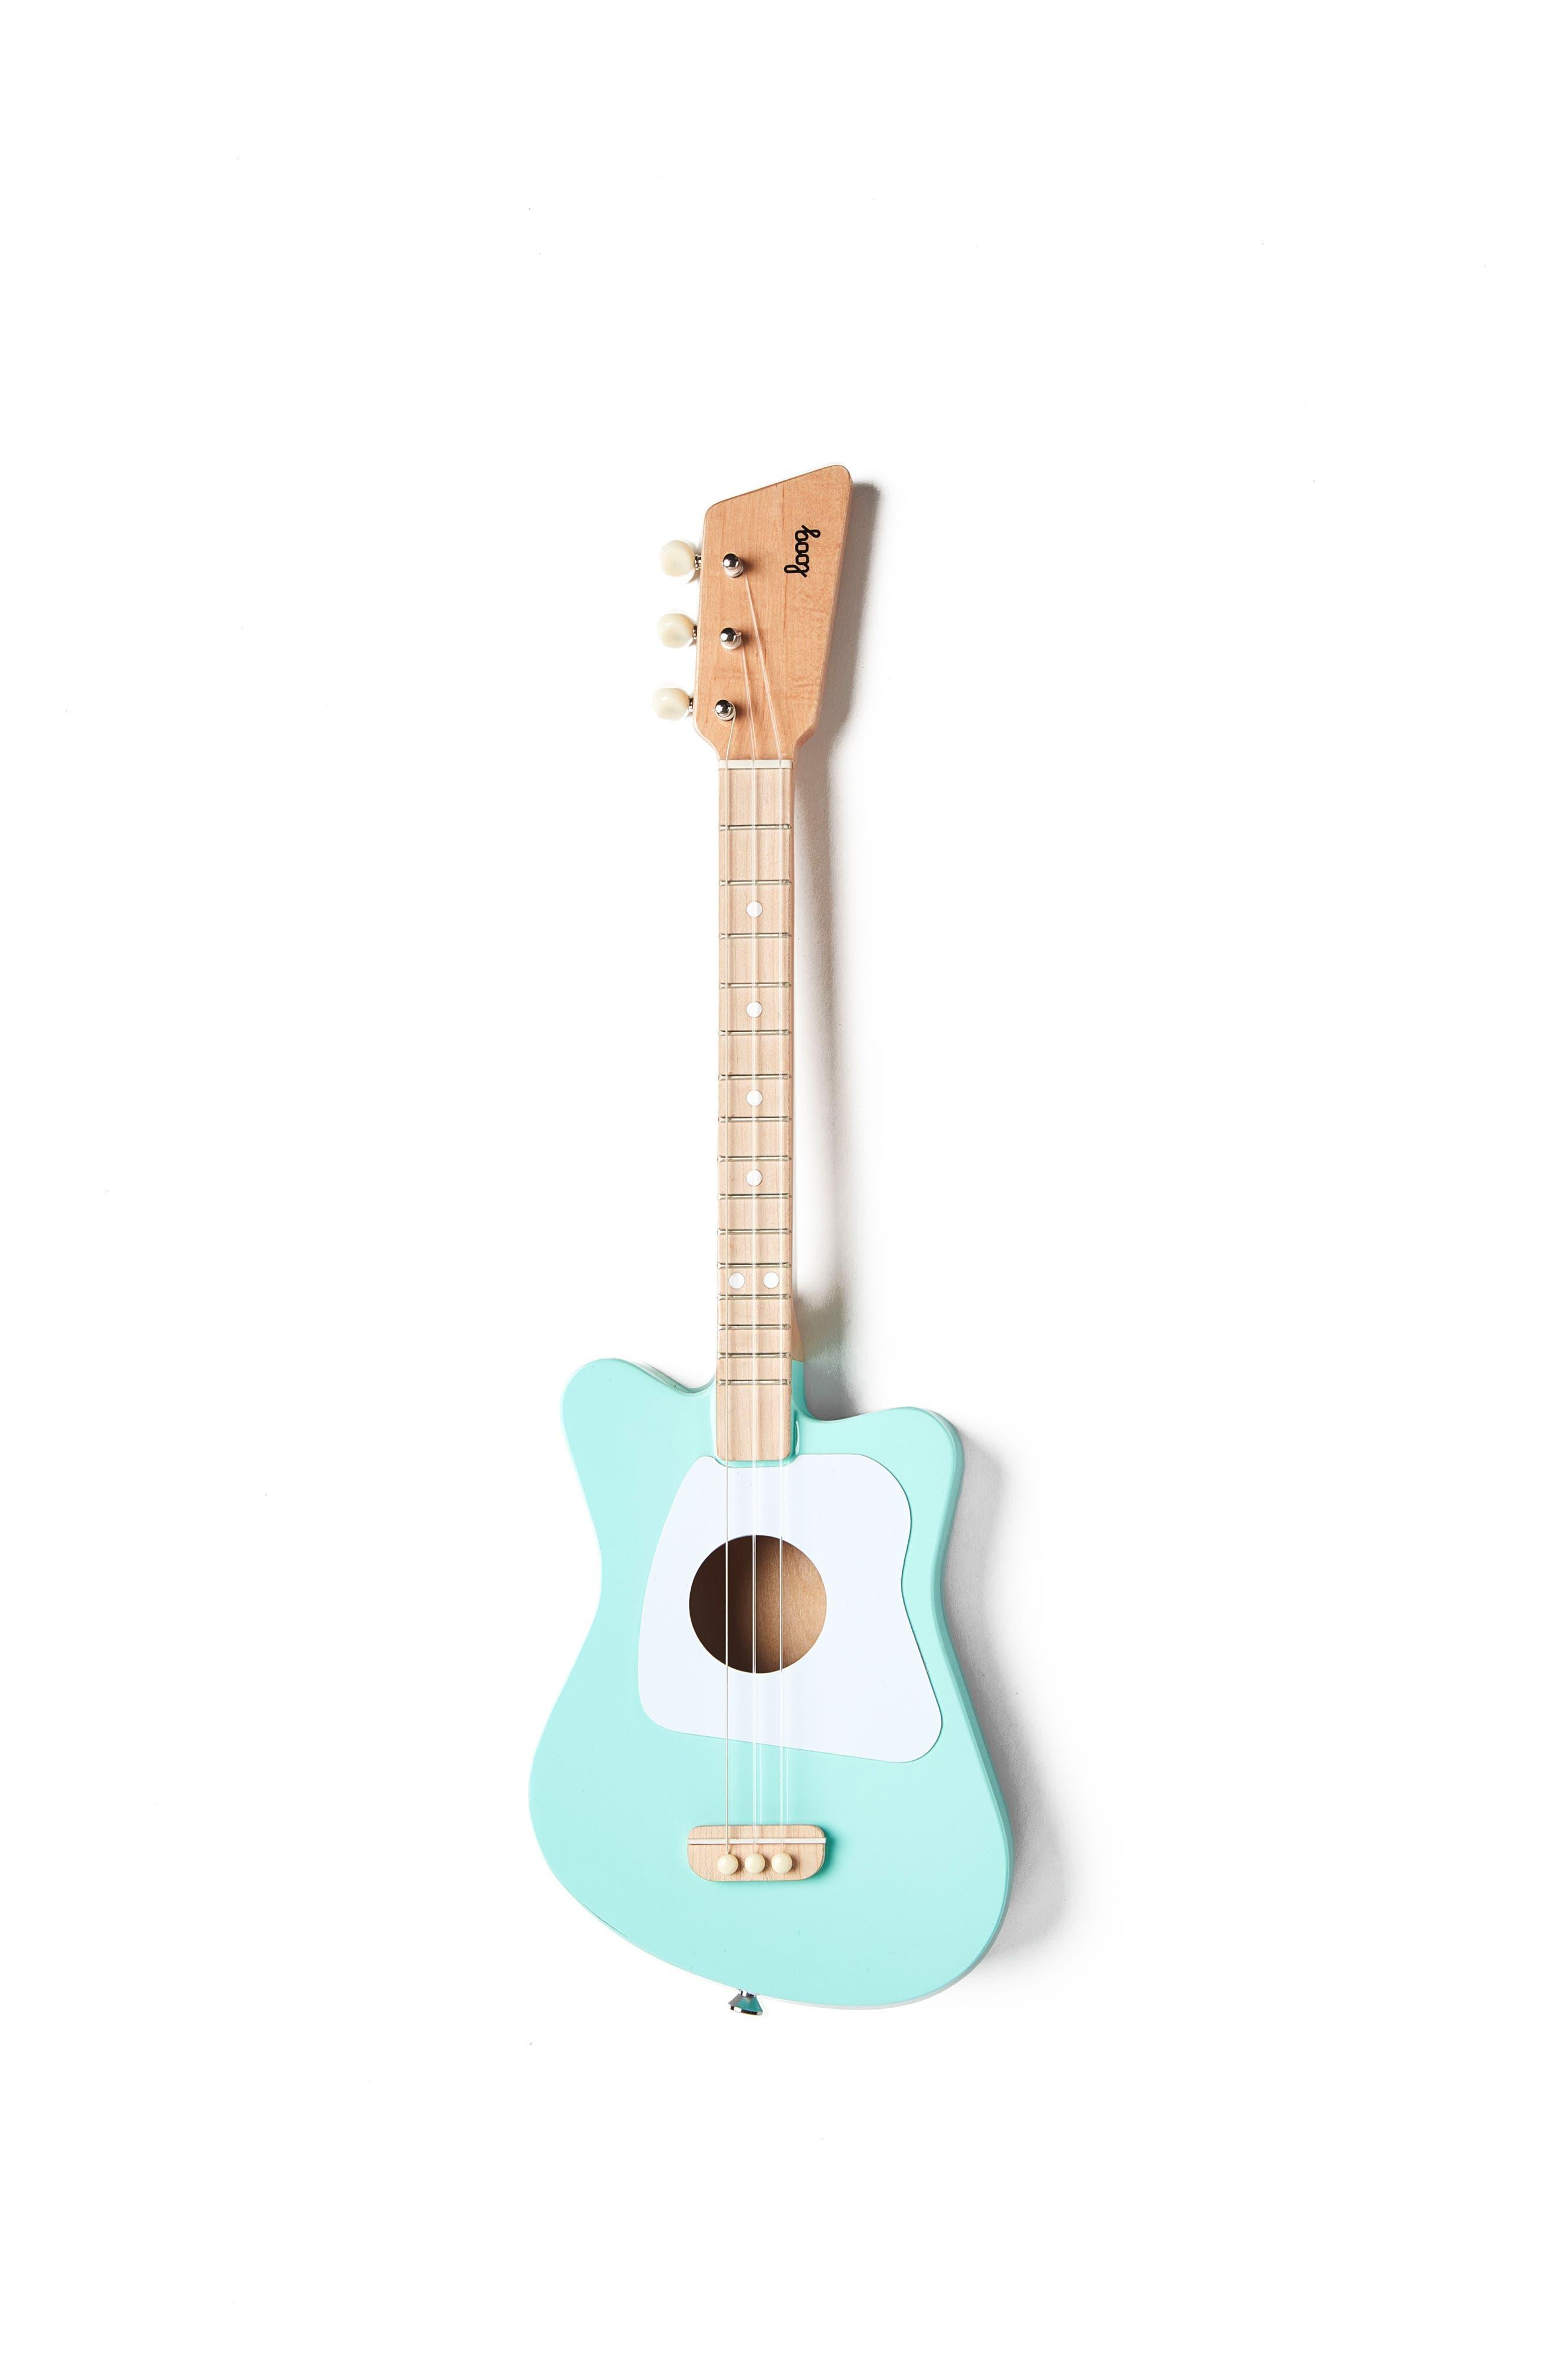 Loog Mini 3-String Wooden Guitar